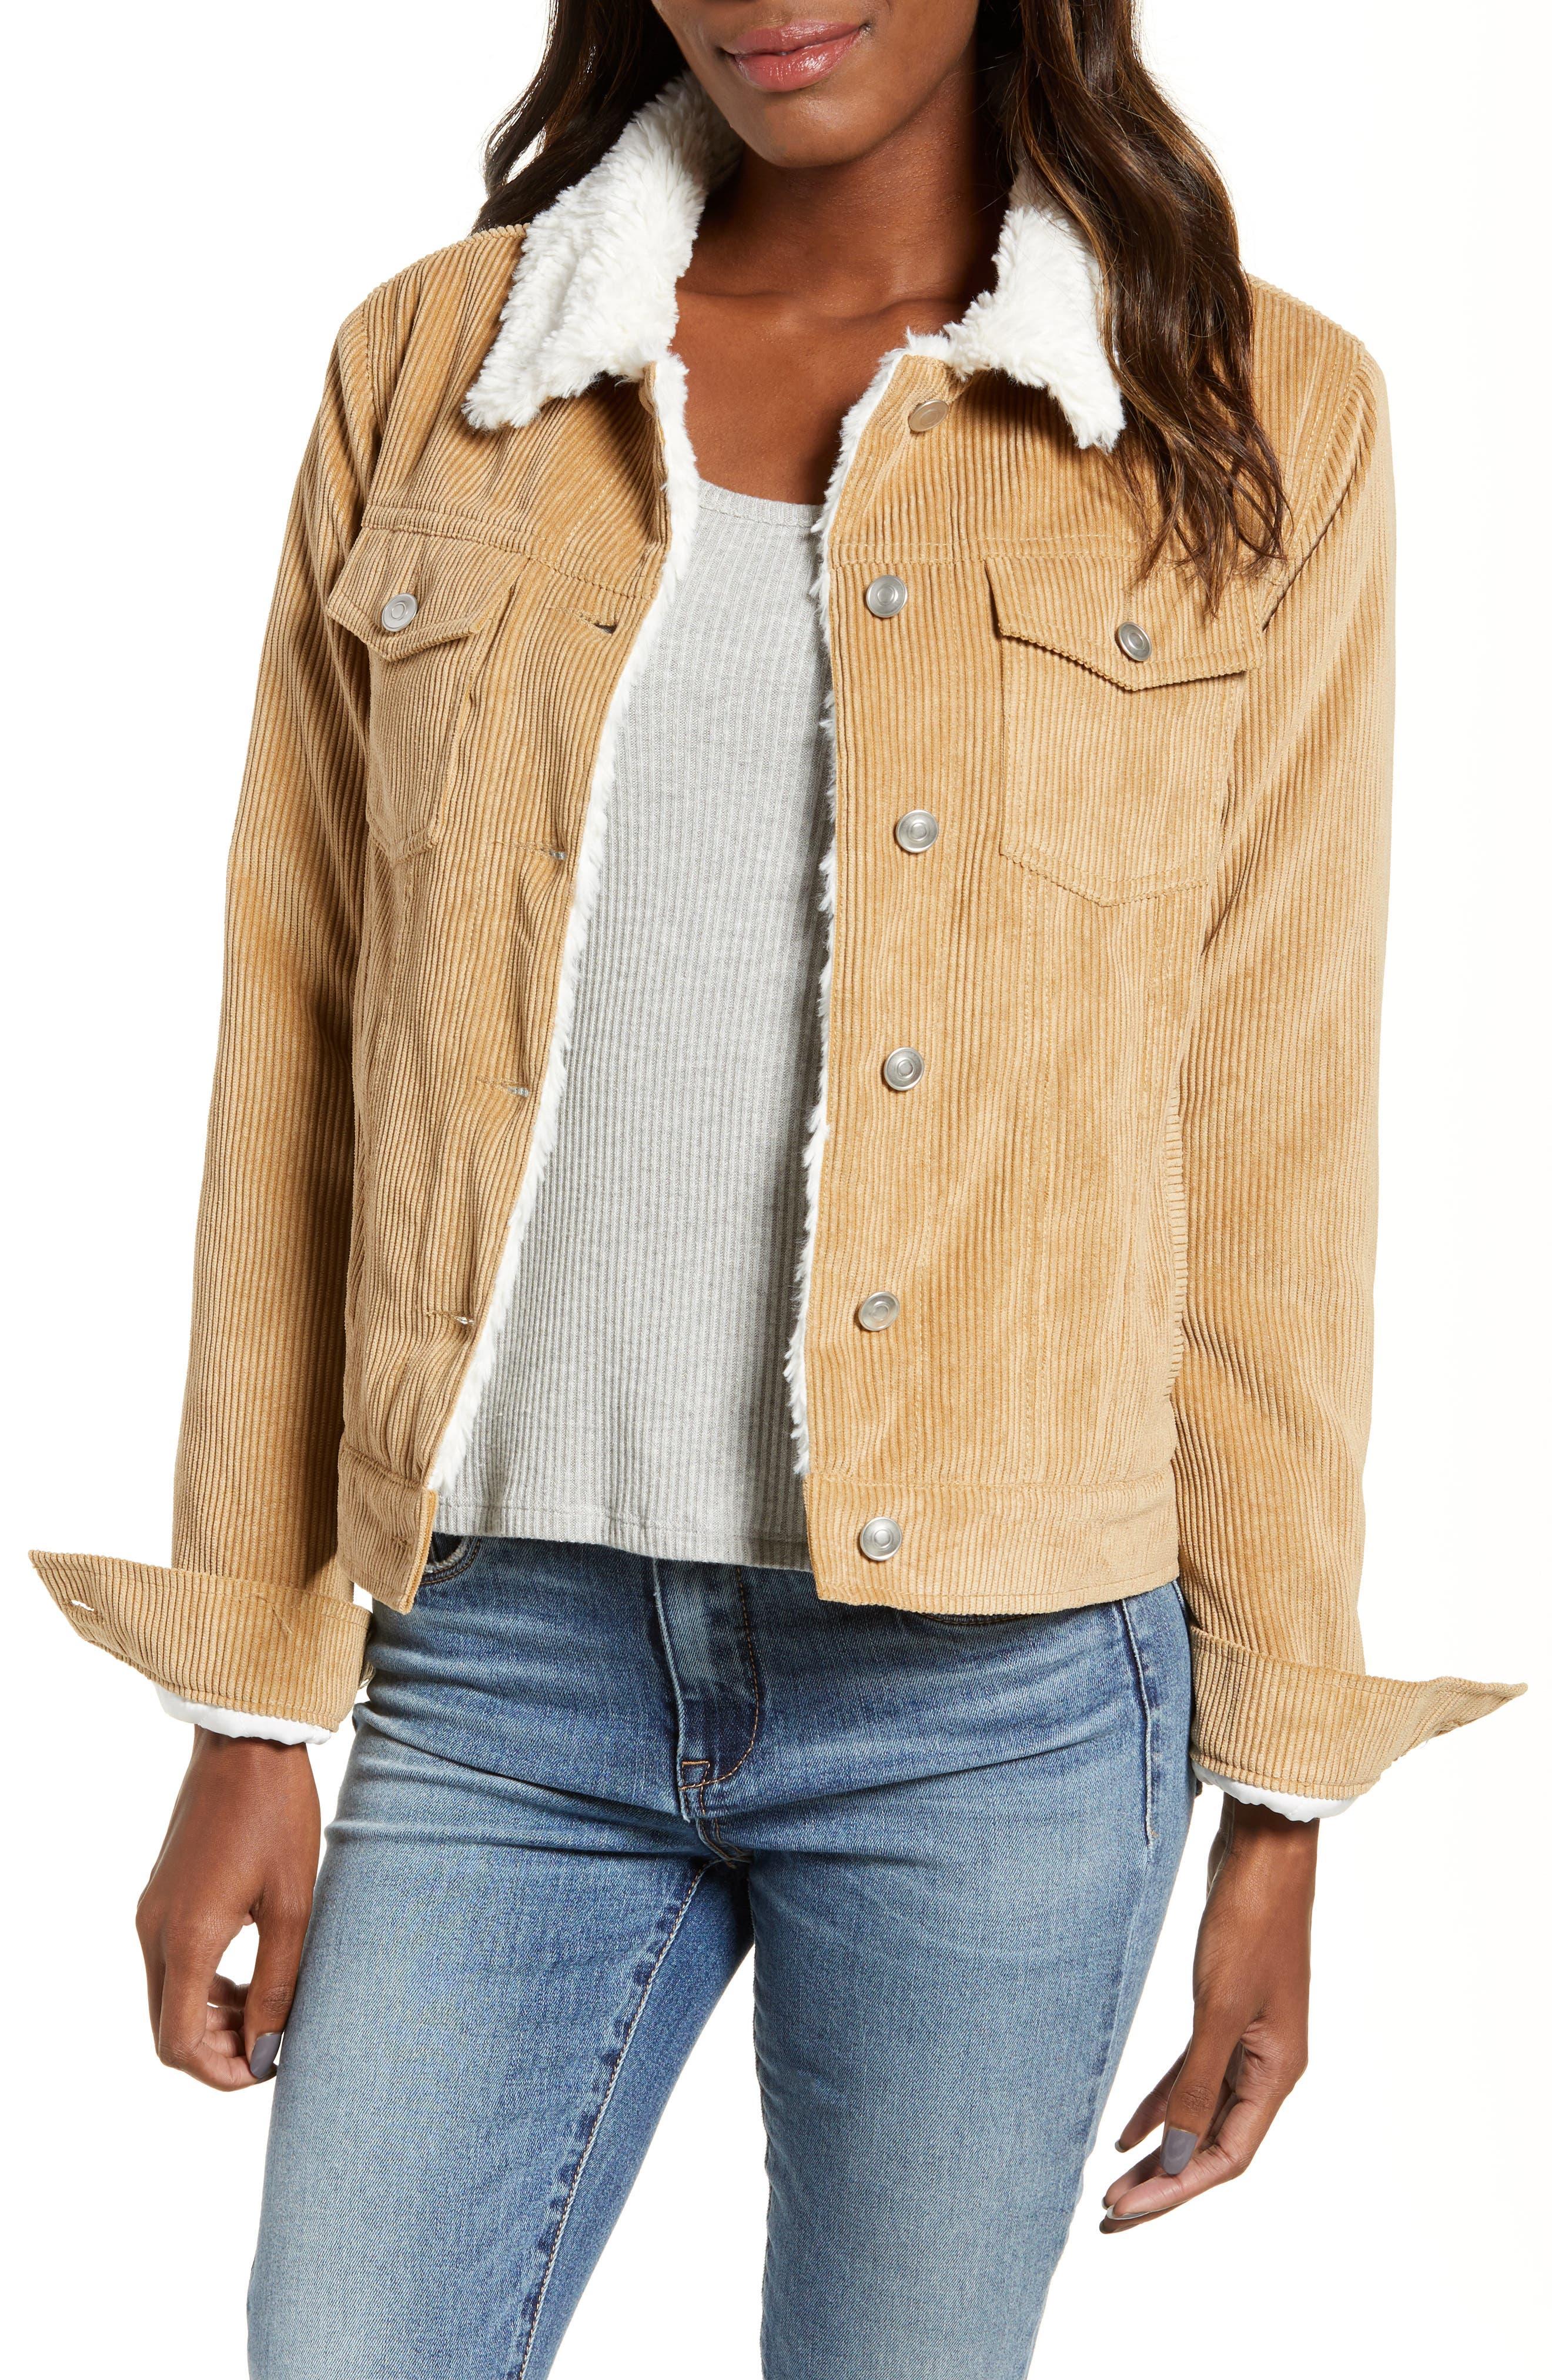 THREAD & SUPPLY Paddington Fleece Lined Corduroy Jacket, Main, color, KHAKI